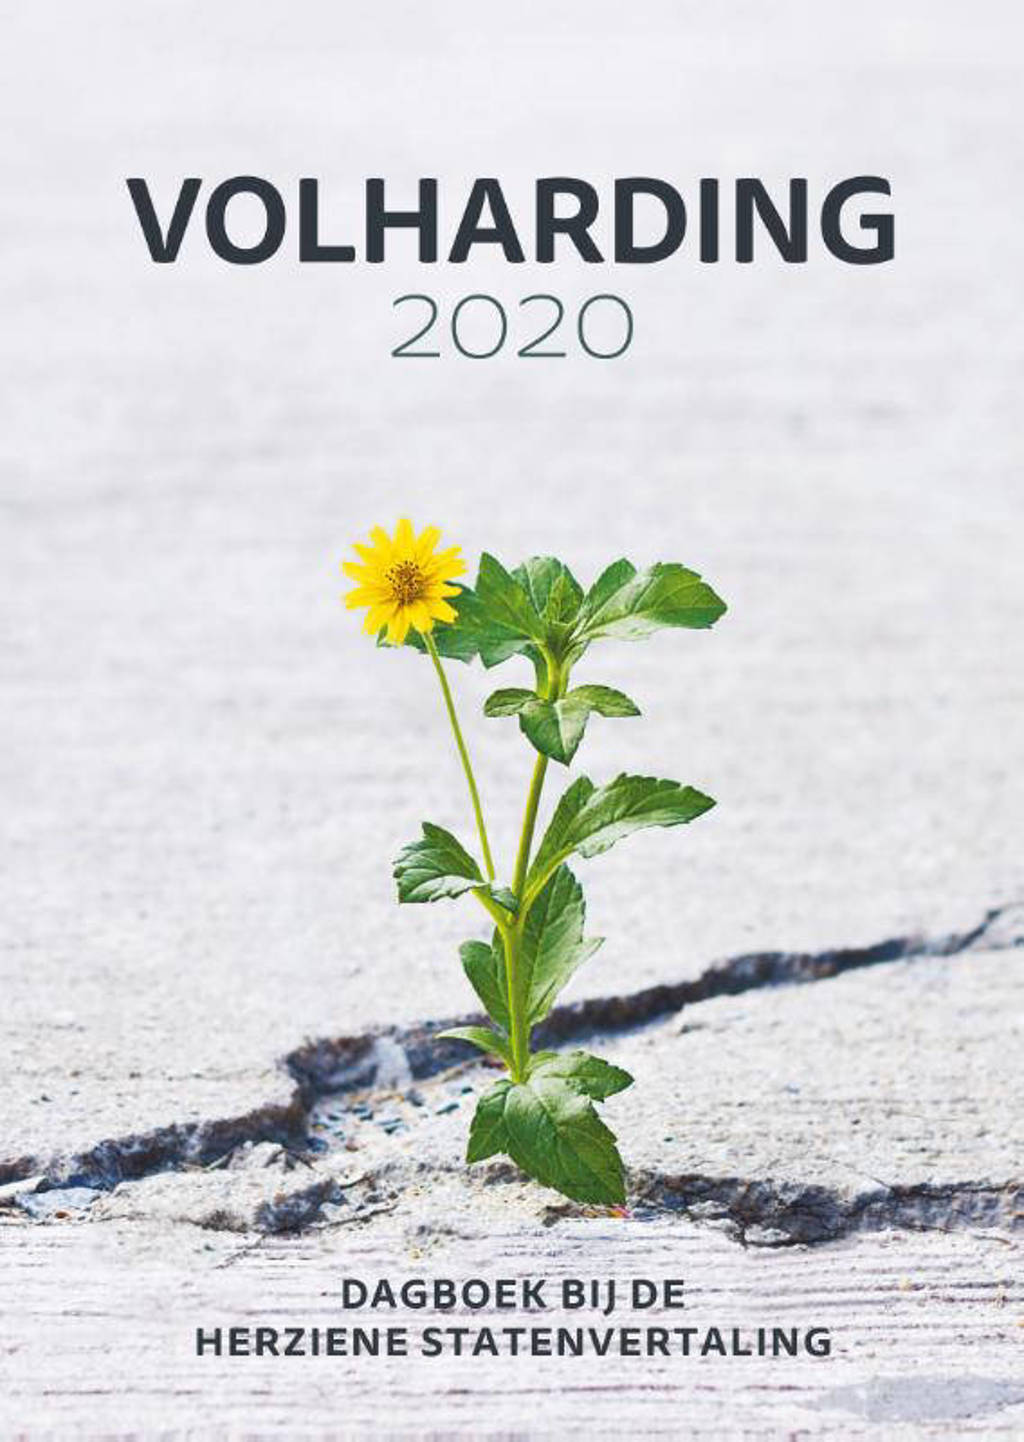 Volharding 2020